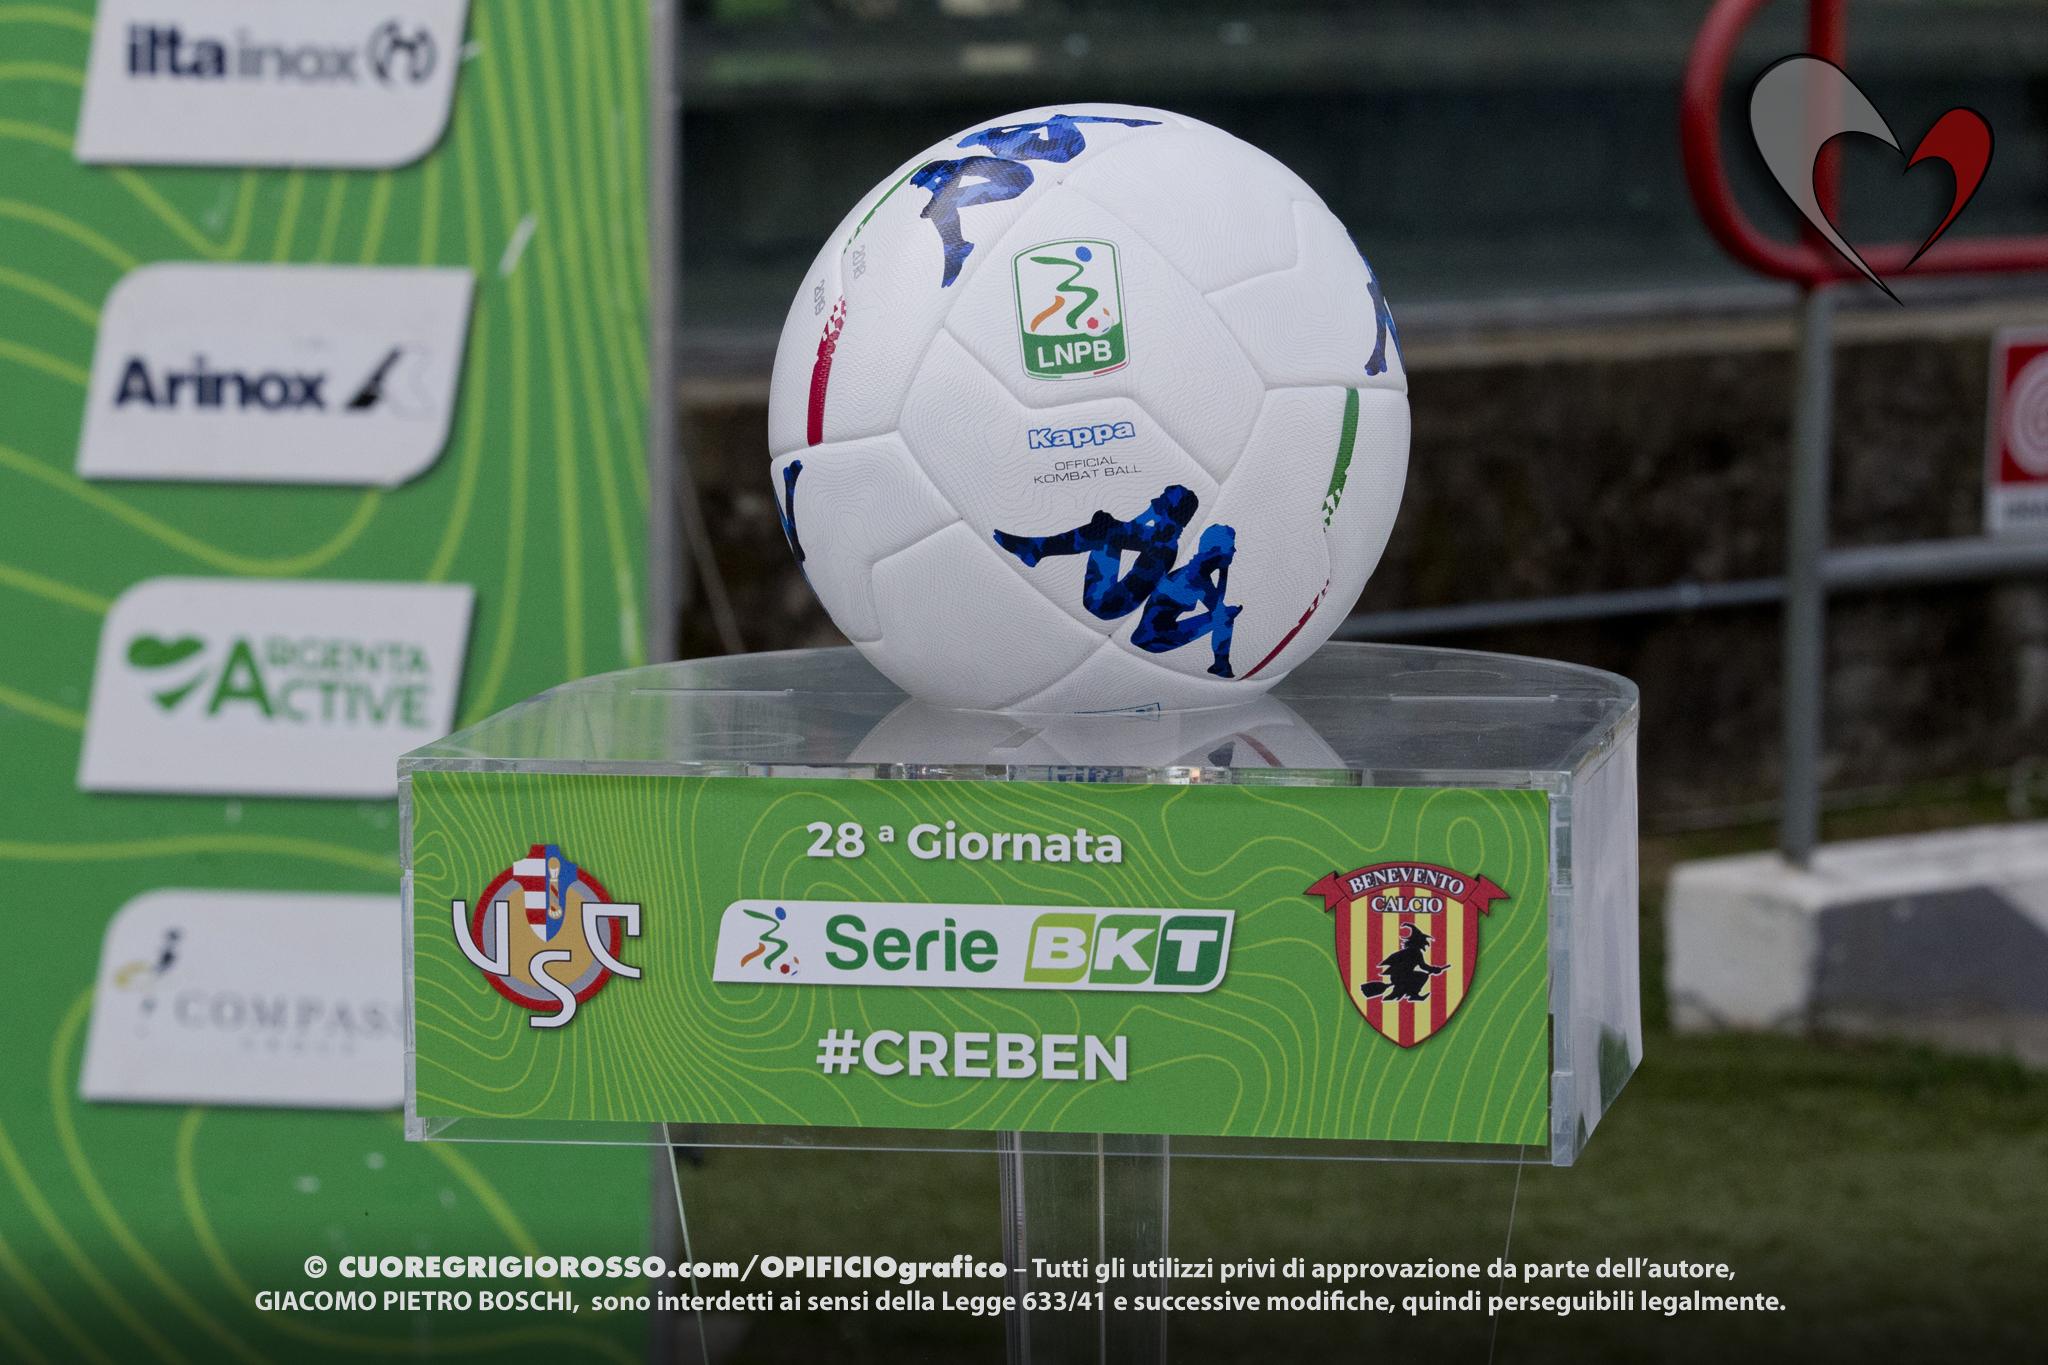 Serie B, pari nel match di apertura Pisa-Benevento